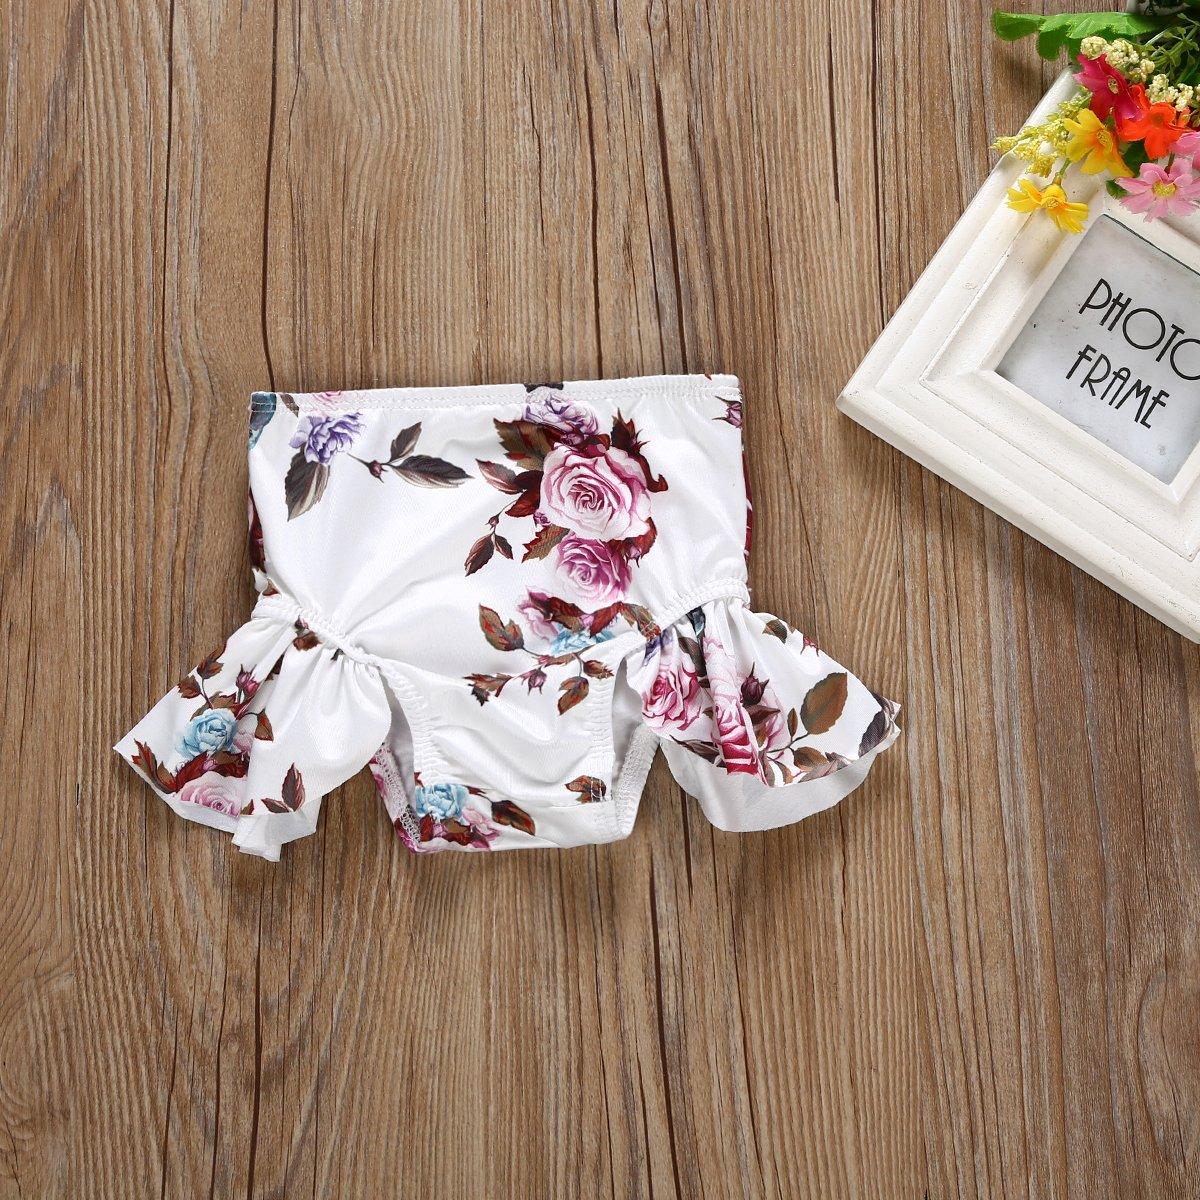 b50c8beb88 Amazon.com: Kids Girl Floral Swimsuits Halter Bathing Suit 2pcs Butterfly  Bow Bikini Set Ruffle Tankini Swimwear: Clothing